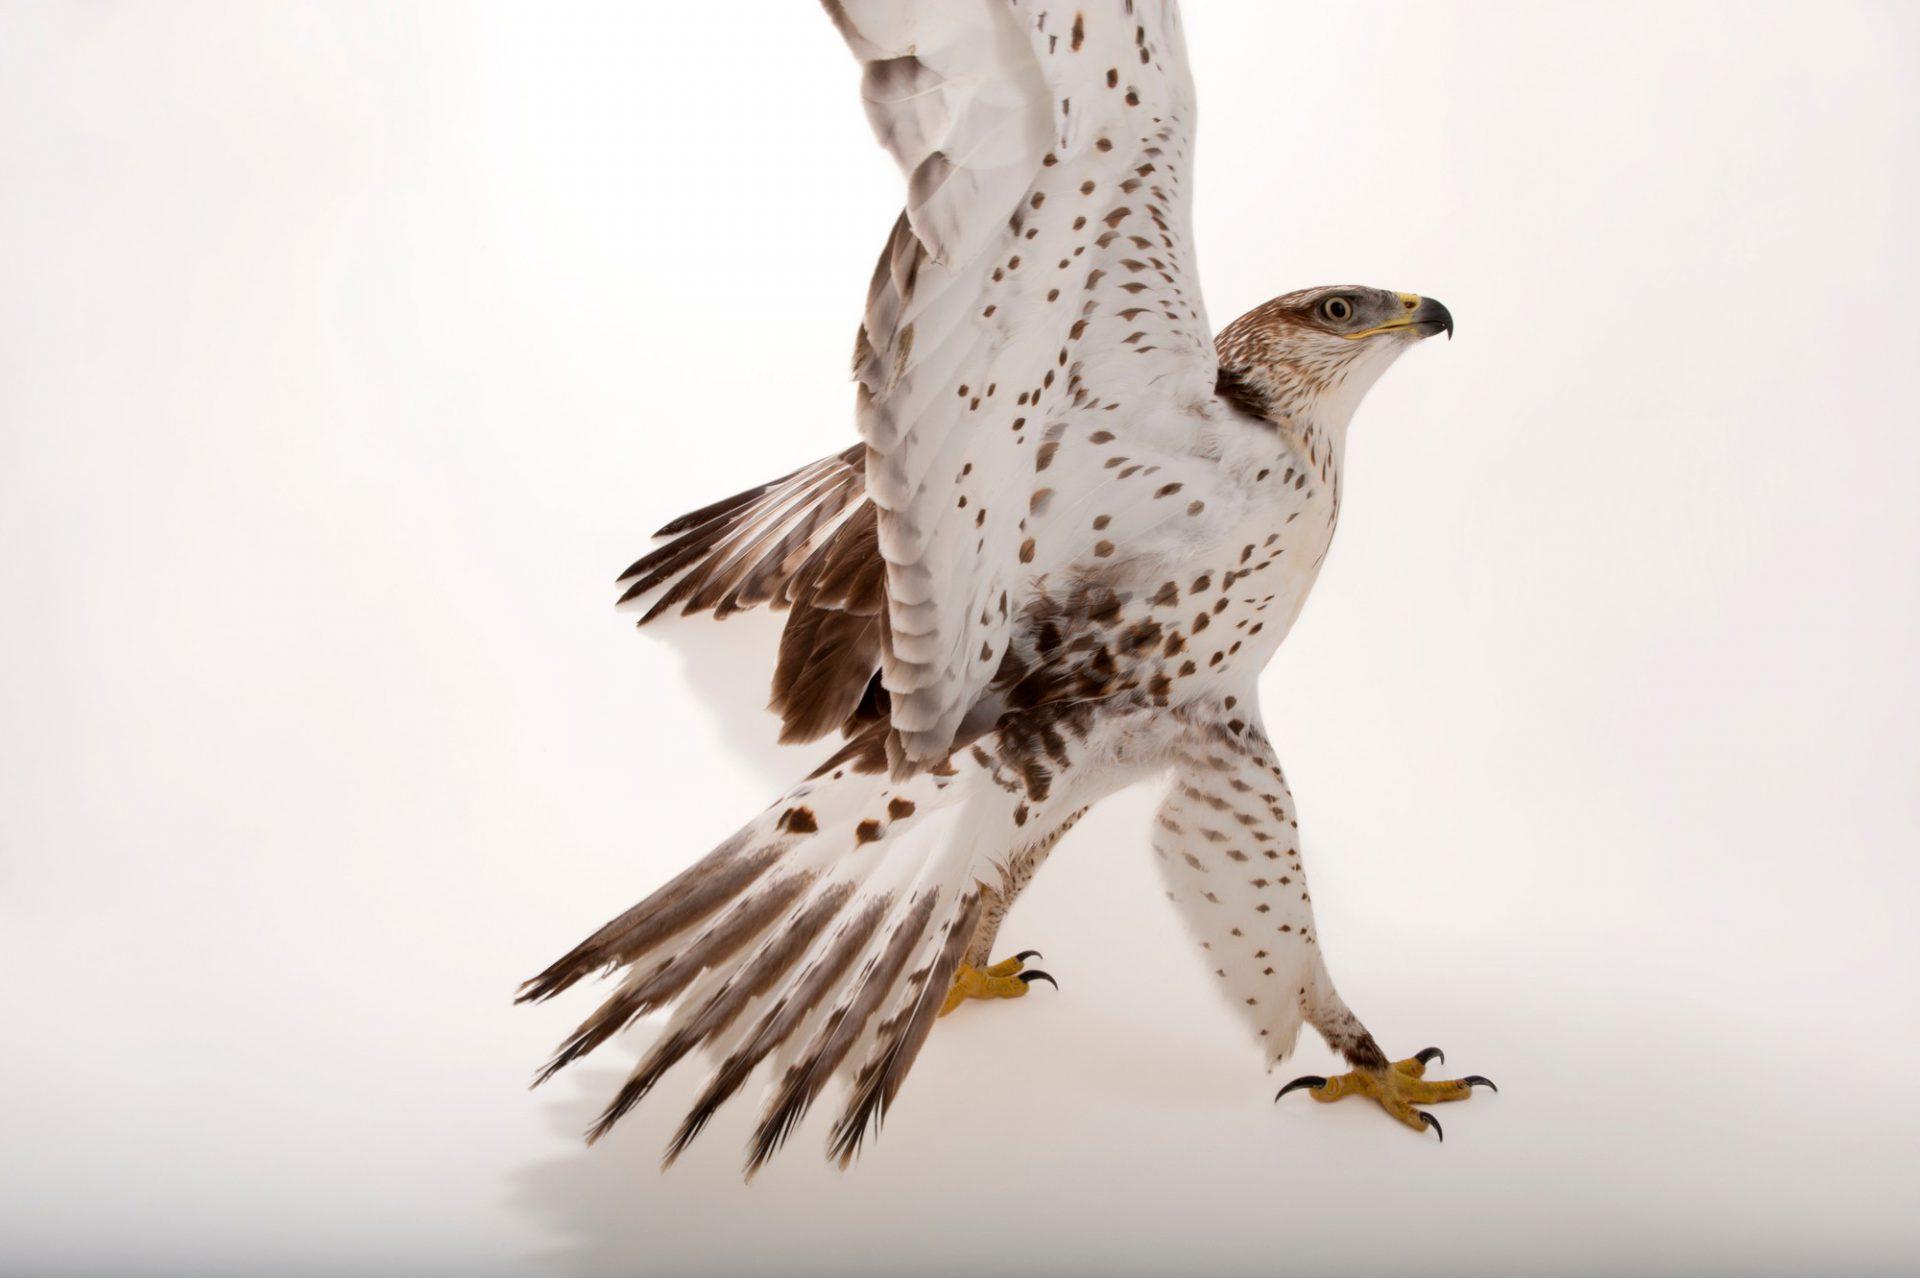 Photo: A ferruginous hawk (Buteo regalis) at the Sutton Avian Research Center.